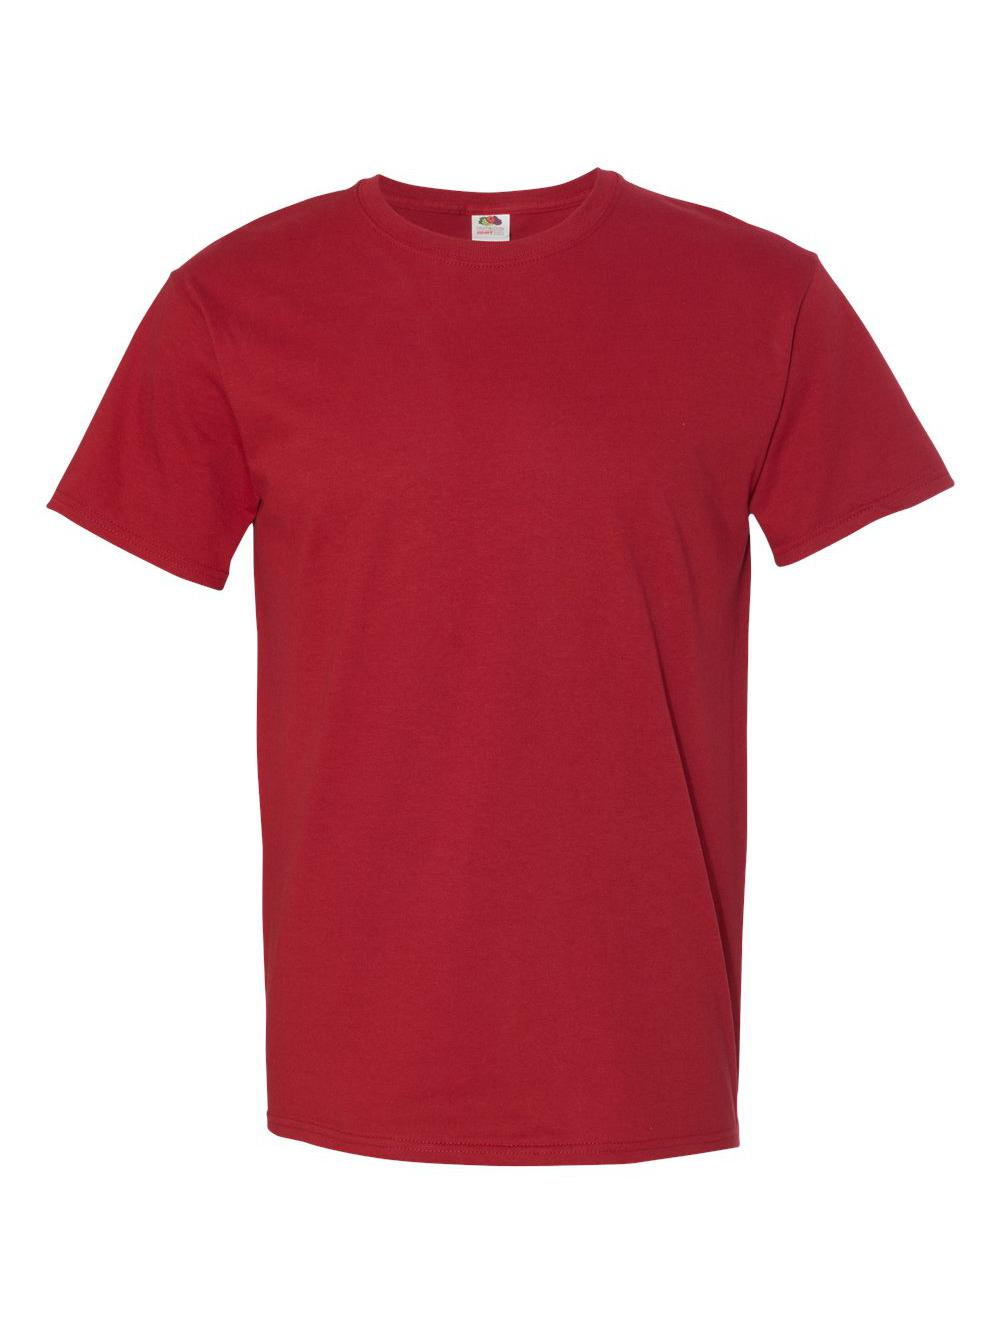 Fruit-of-the-Loom-HD-Cotton-Short-Sleeve-T-Shirt-3930R thumbnail 39